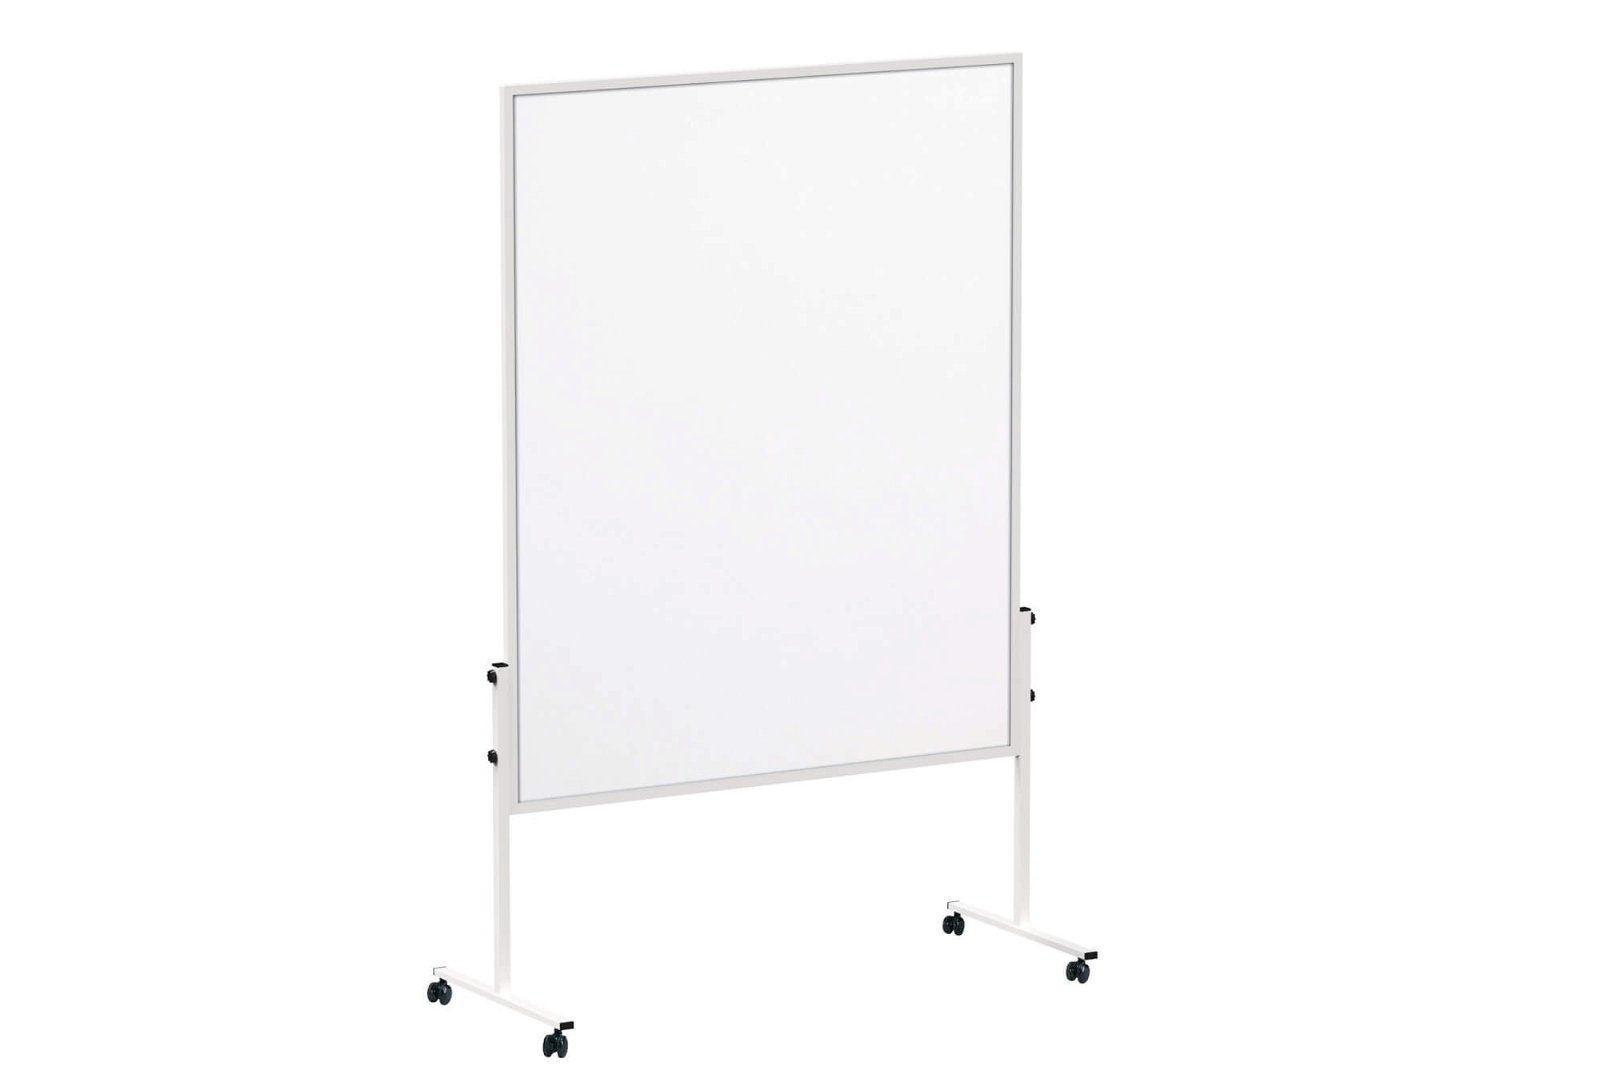 Moderationstafel MAULsolid Papier, 150x120 cm, grau